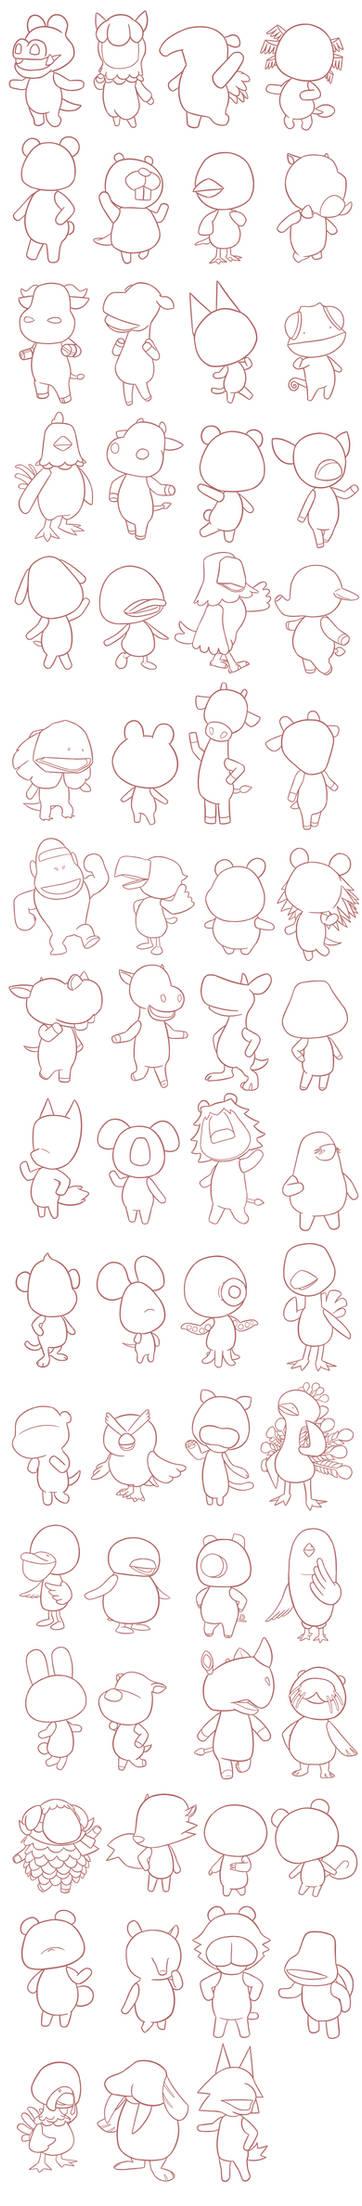 Animal Crossing Villagers Base [F2U]